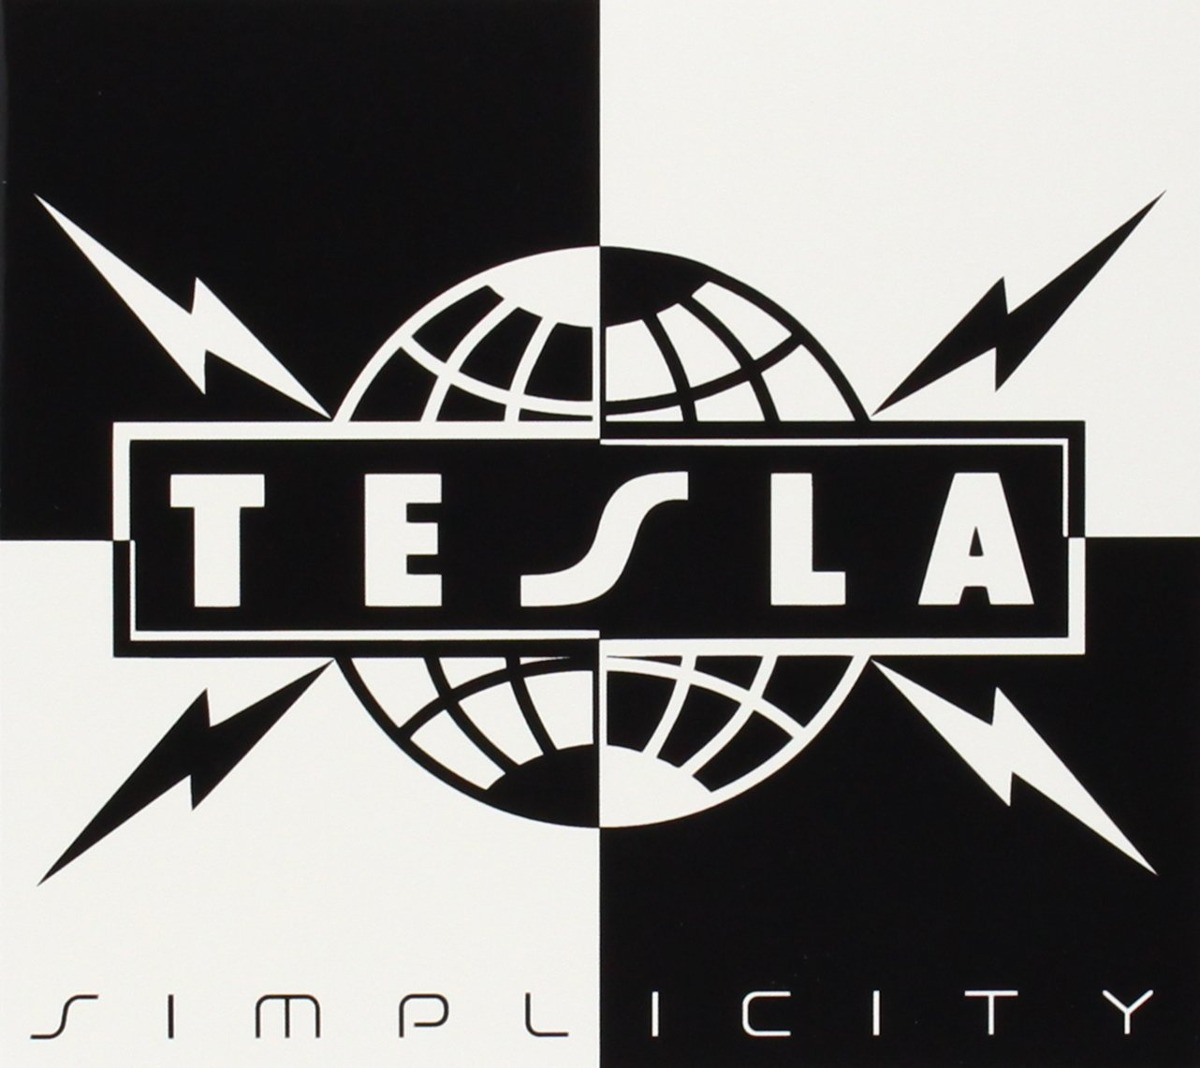 TESLA: discografía - Página 10 Cd-tesla-simplicity-cd-D_NQ_NP_834520-MLA27846217078_072018-F